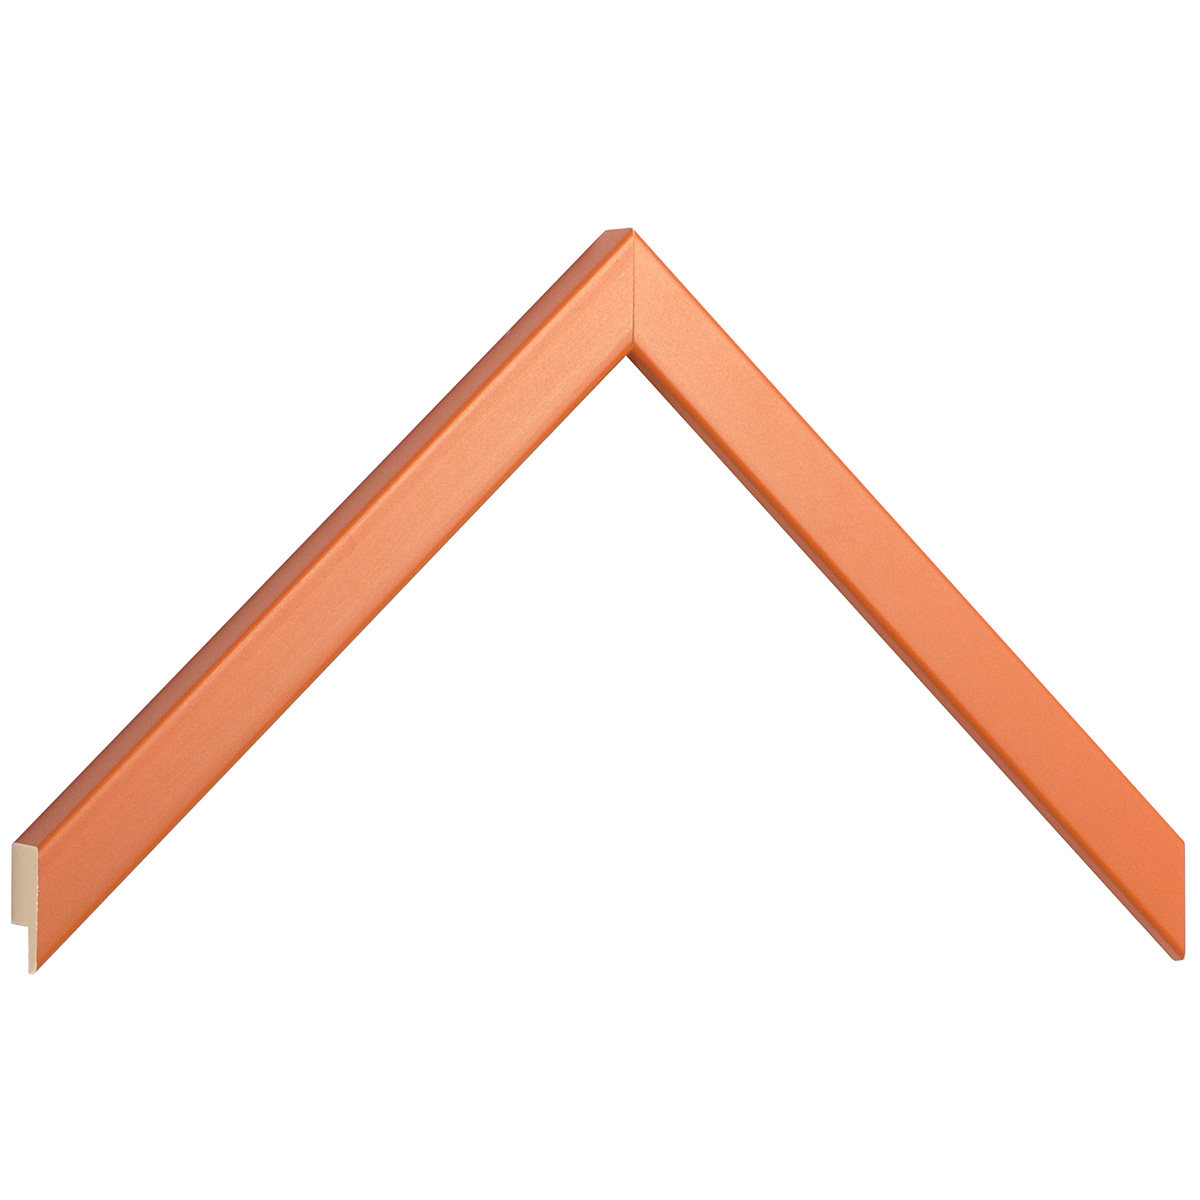 Moulding ayous width 15mm height 14 - orange